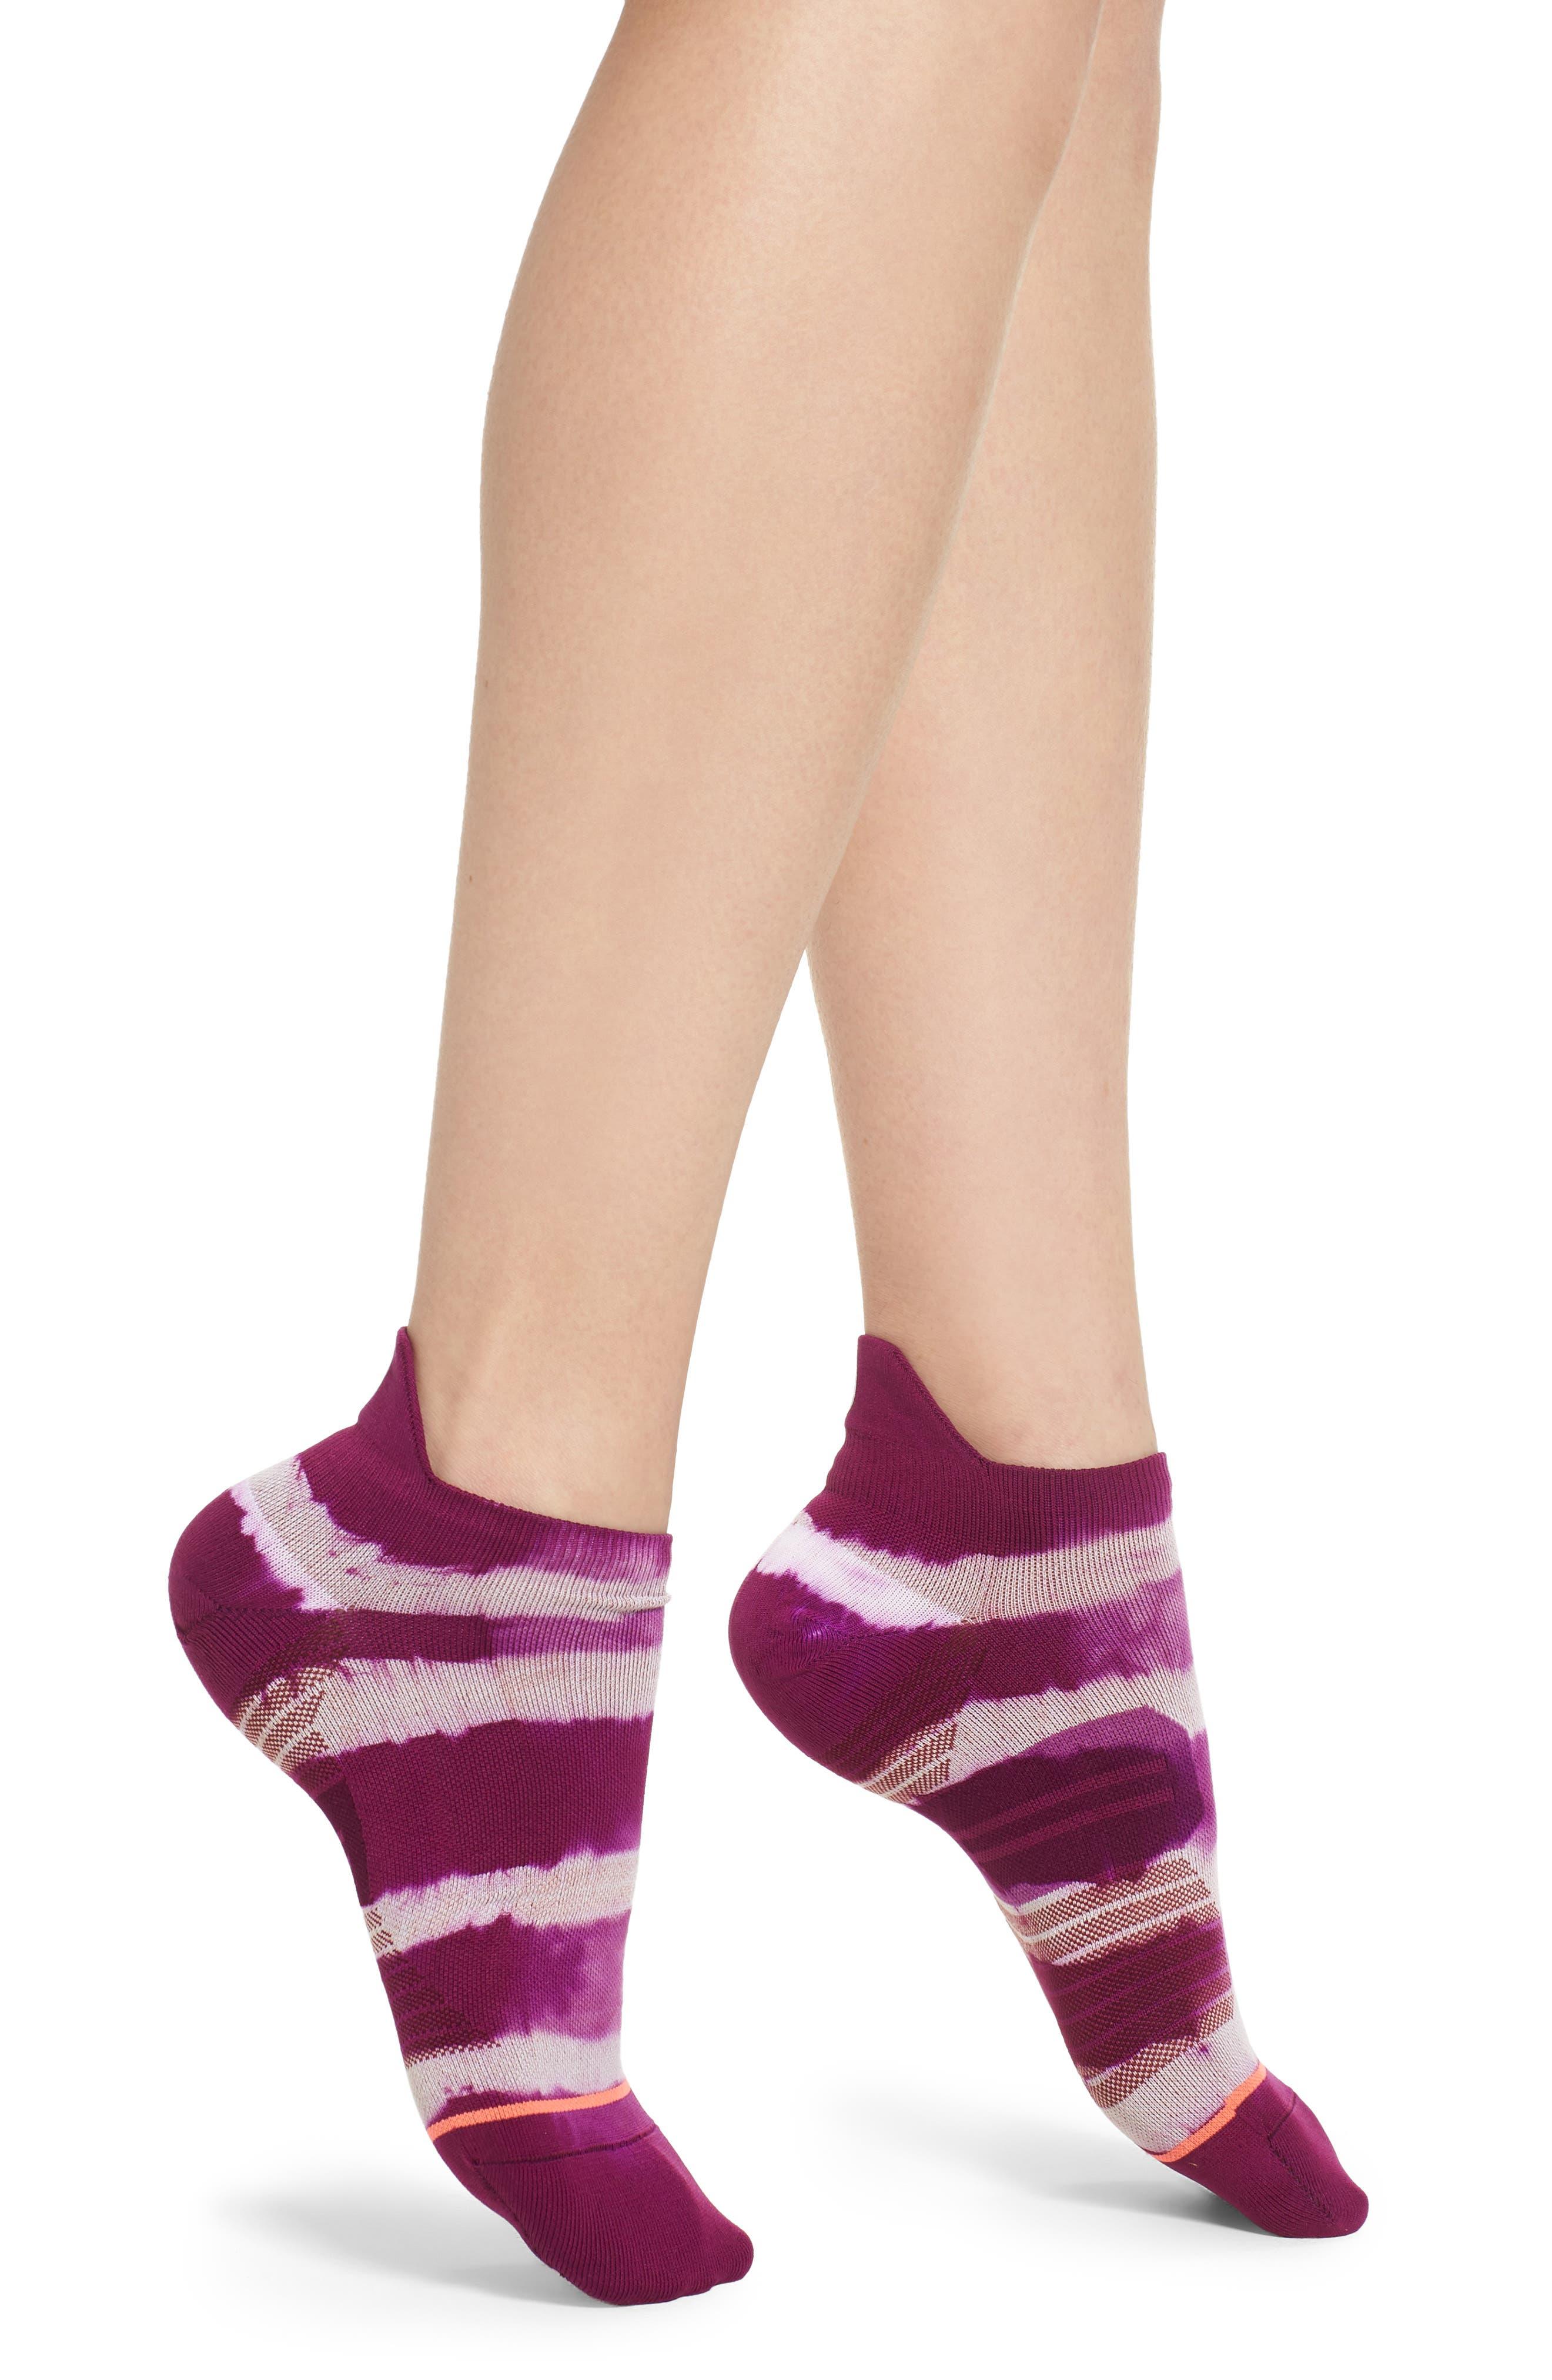 Downhill Tab Running Socks,                             Main thumbnail 1, color,                             Purple